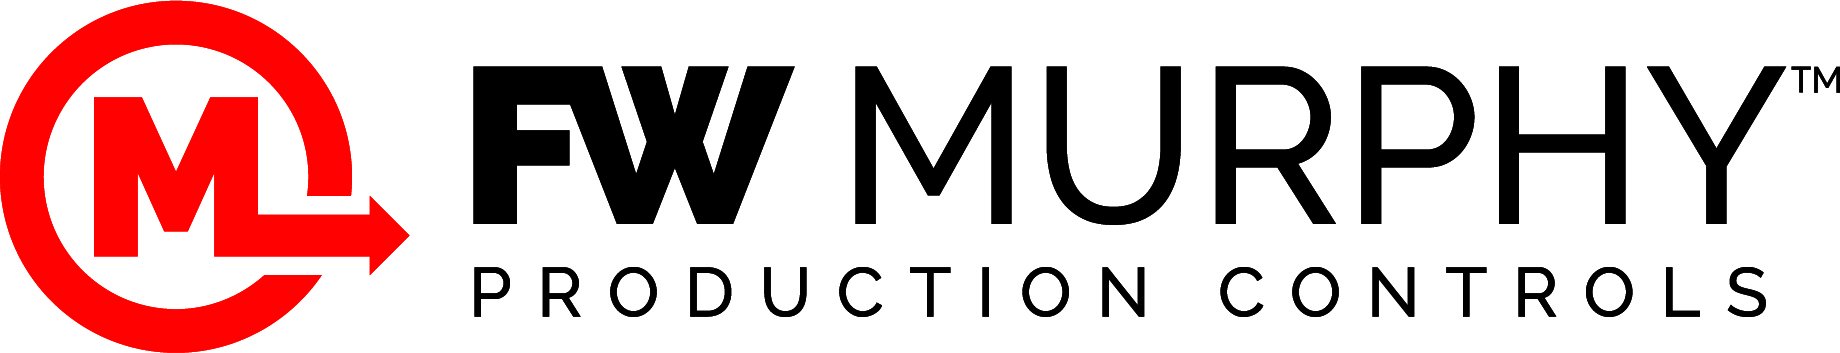 Fw Murphy Logotype